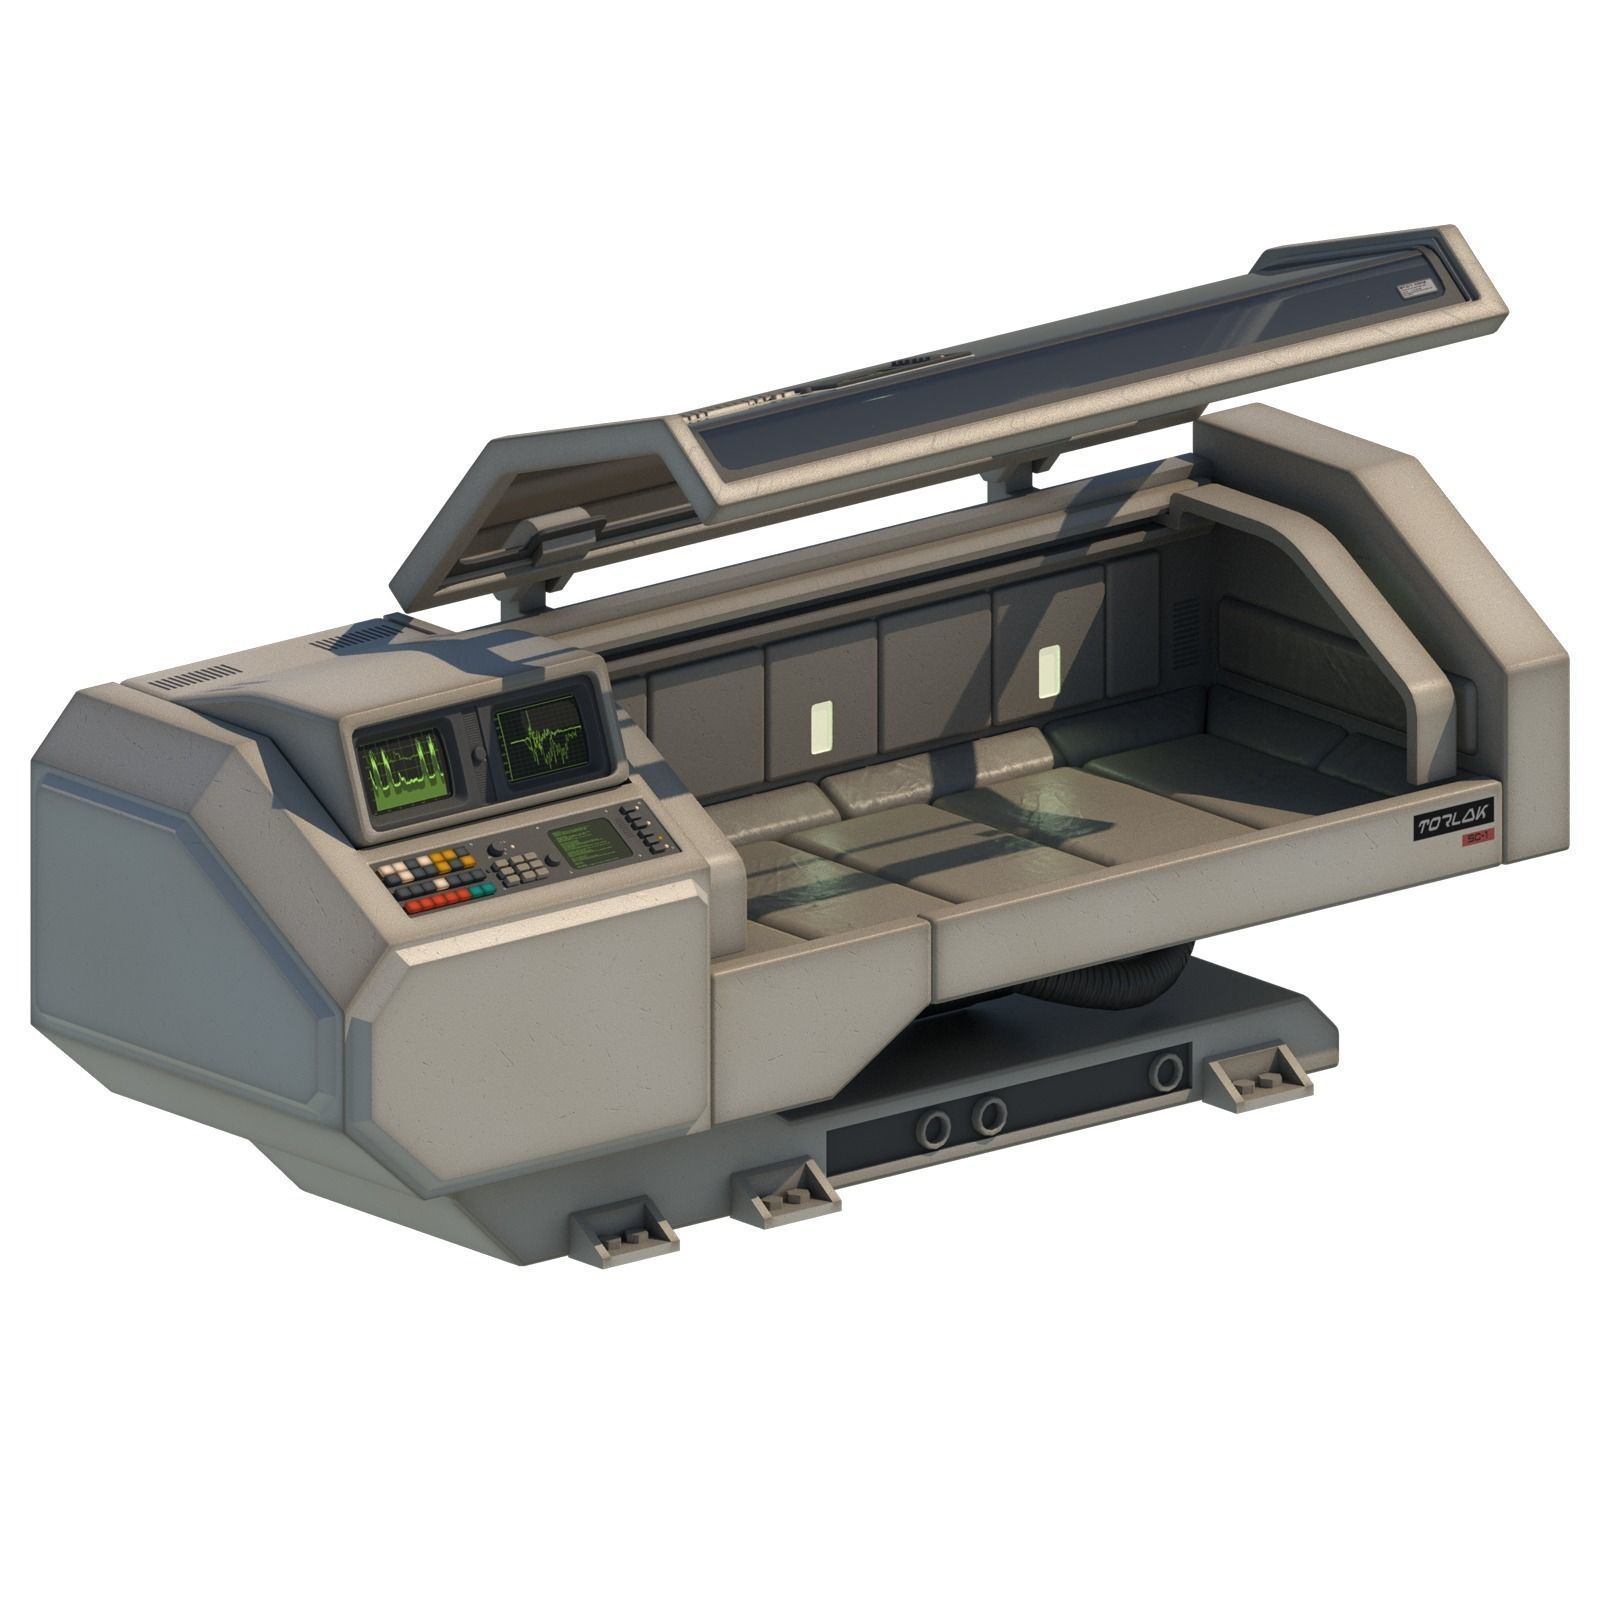 Retro Sci-fi Healing Machine